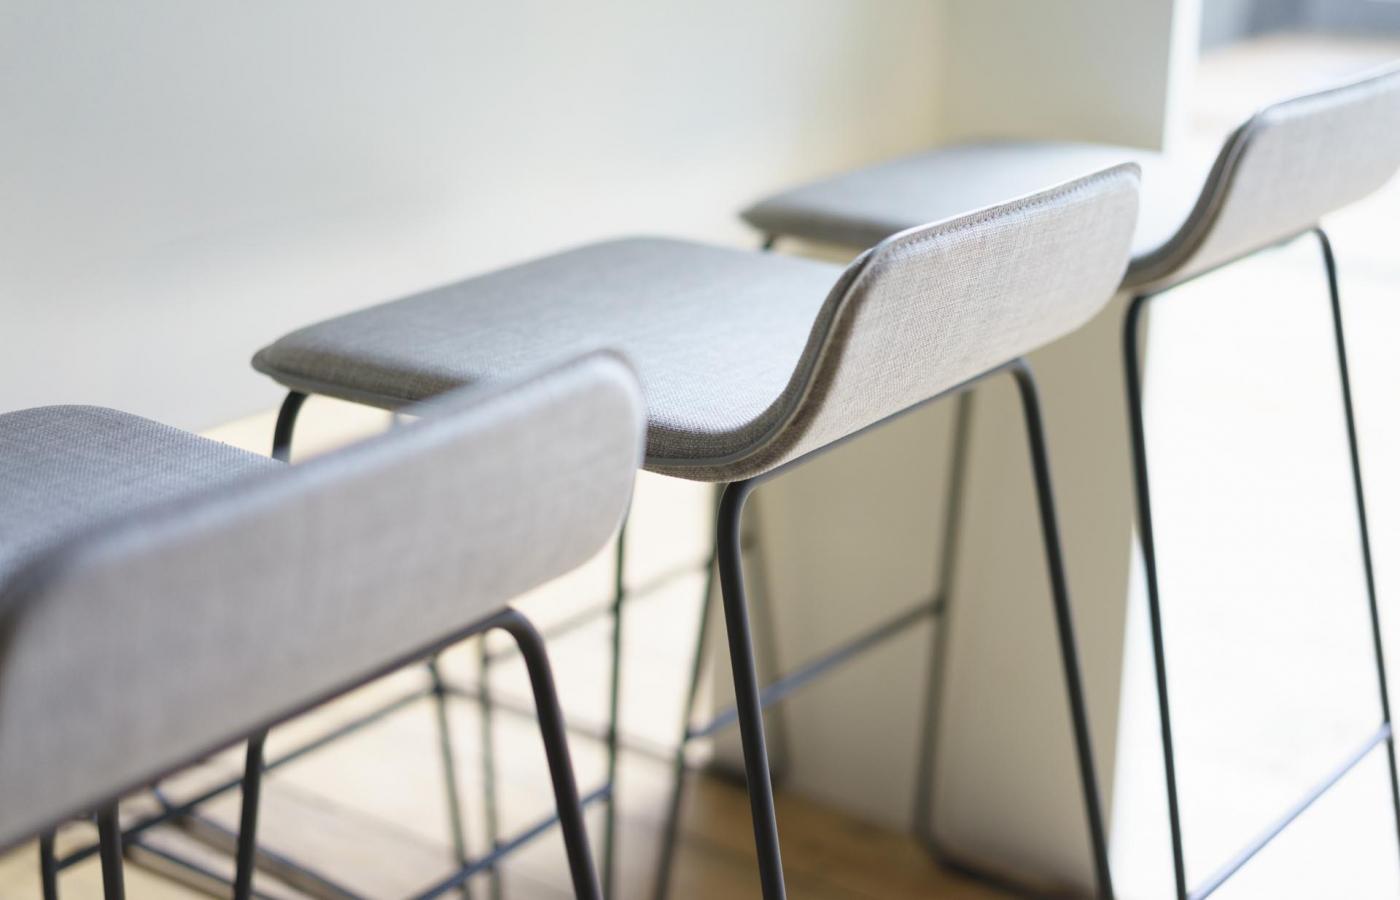 Lolli stool